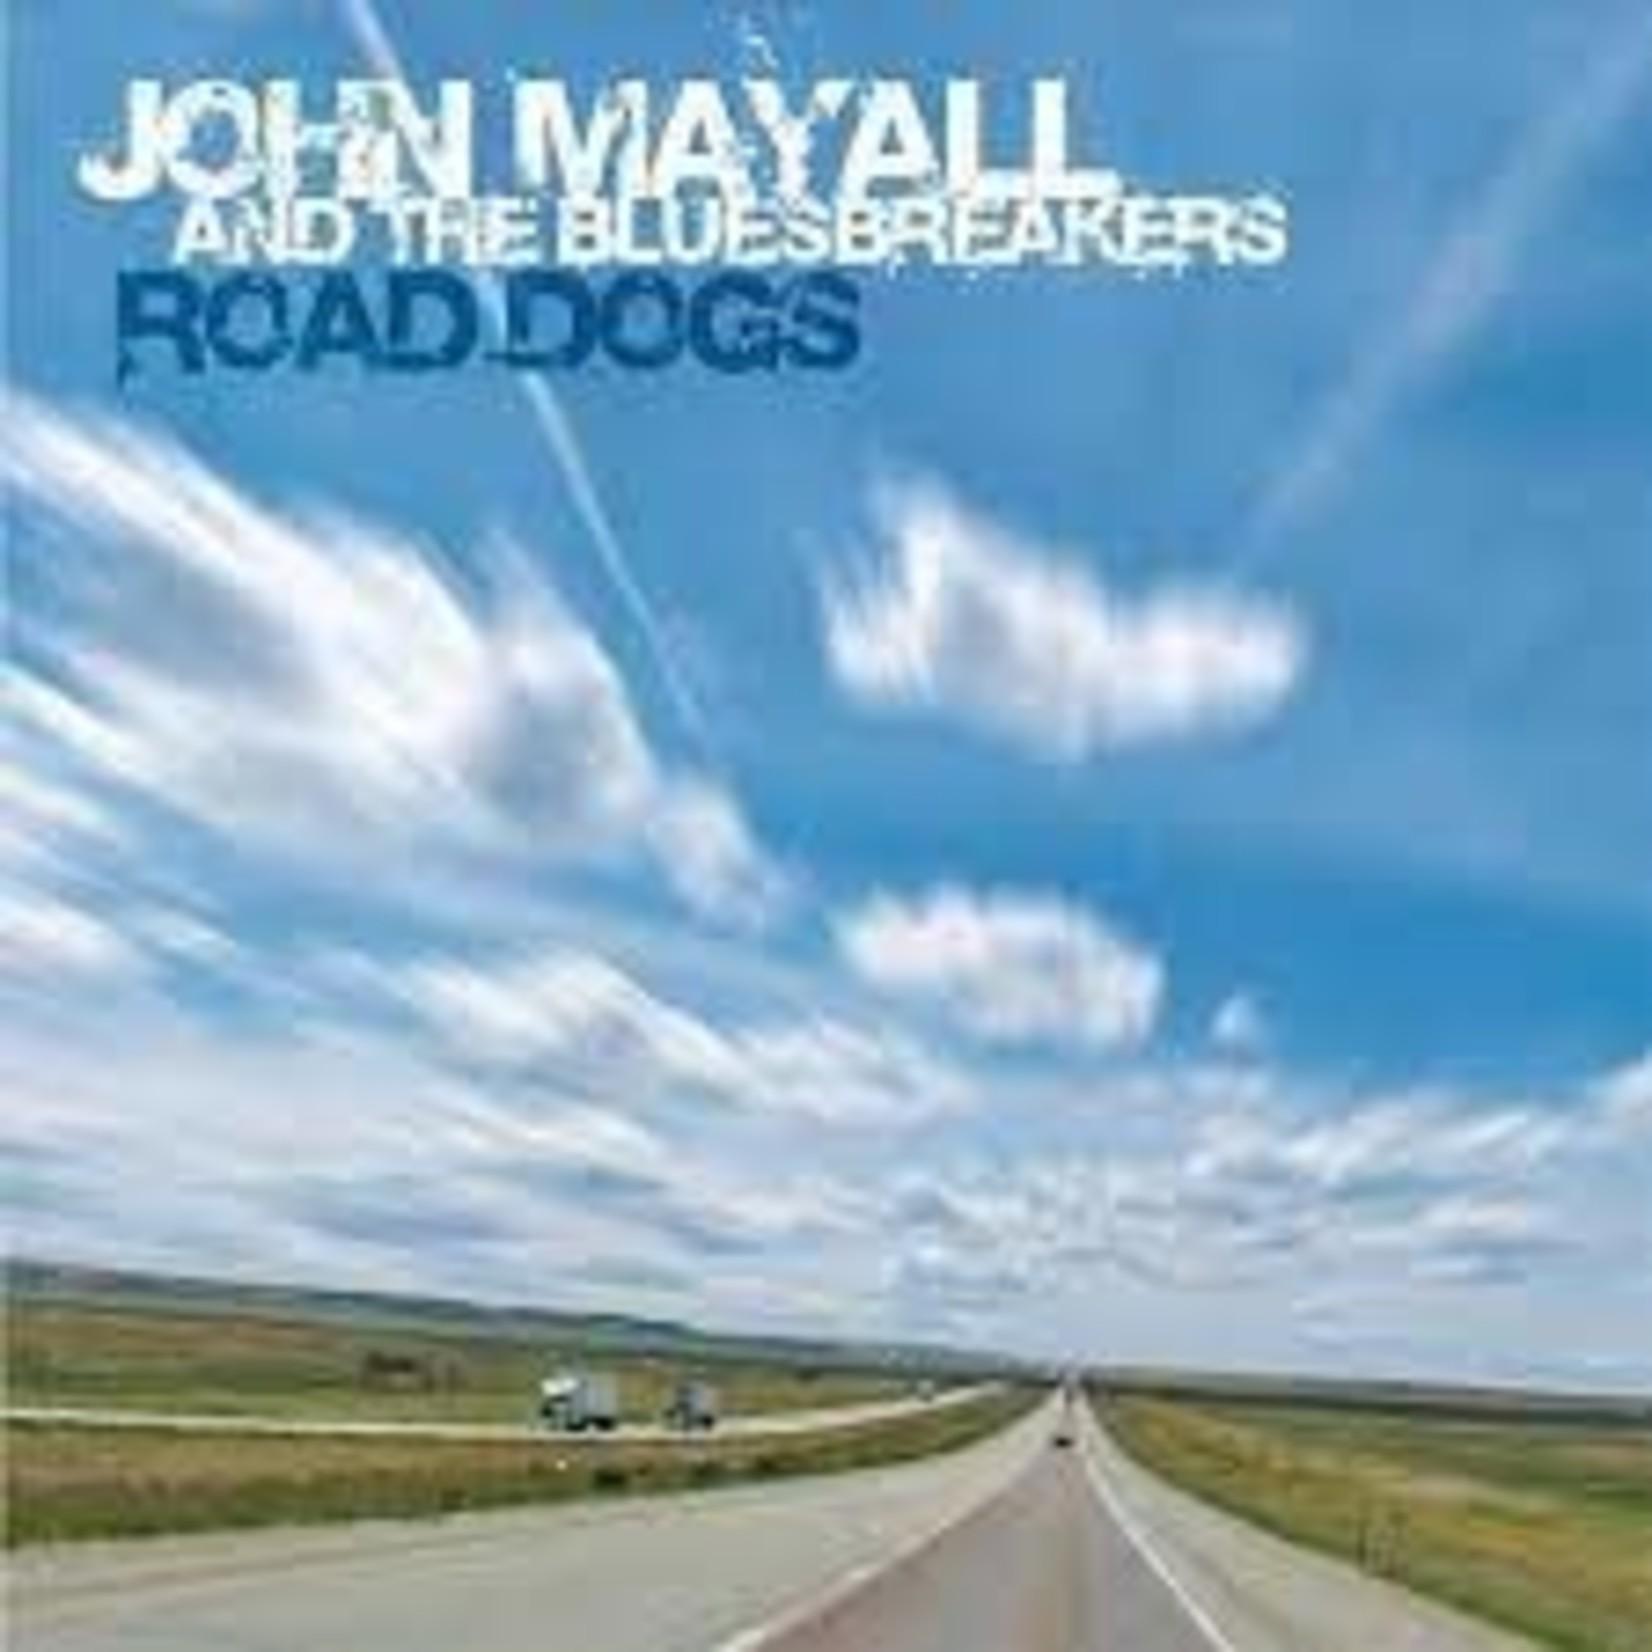 JOHN MAYALL & THE BLUESBREAKERS - ROAD DOGS  2LP (VINYL)